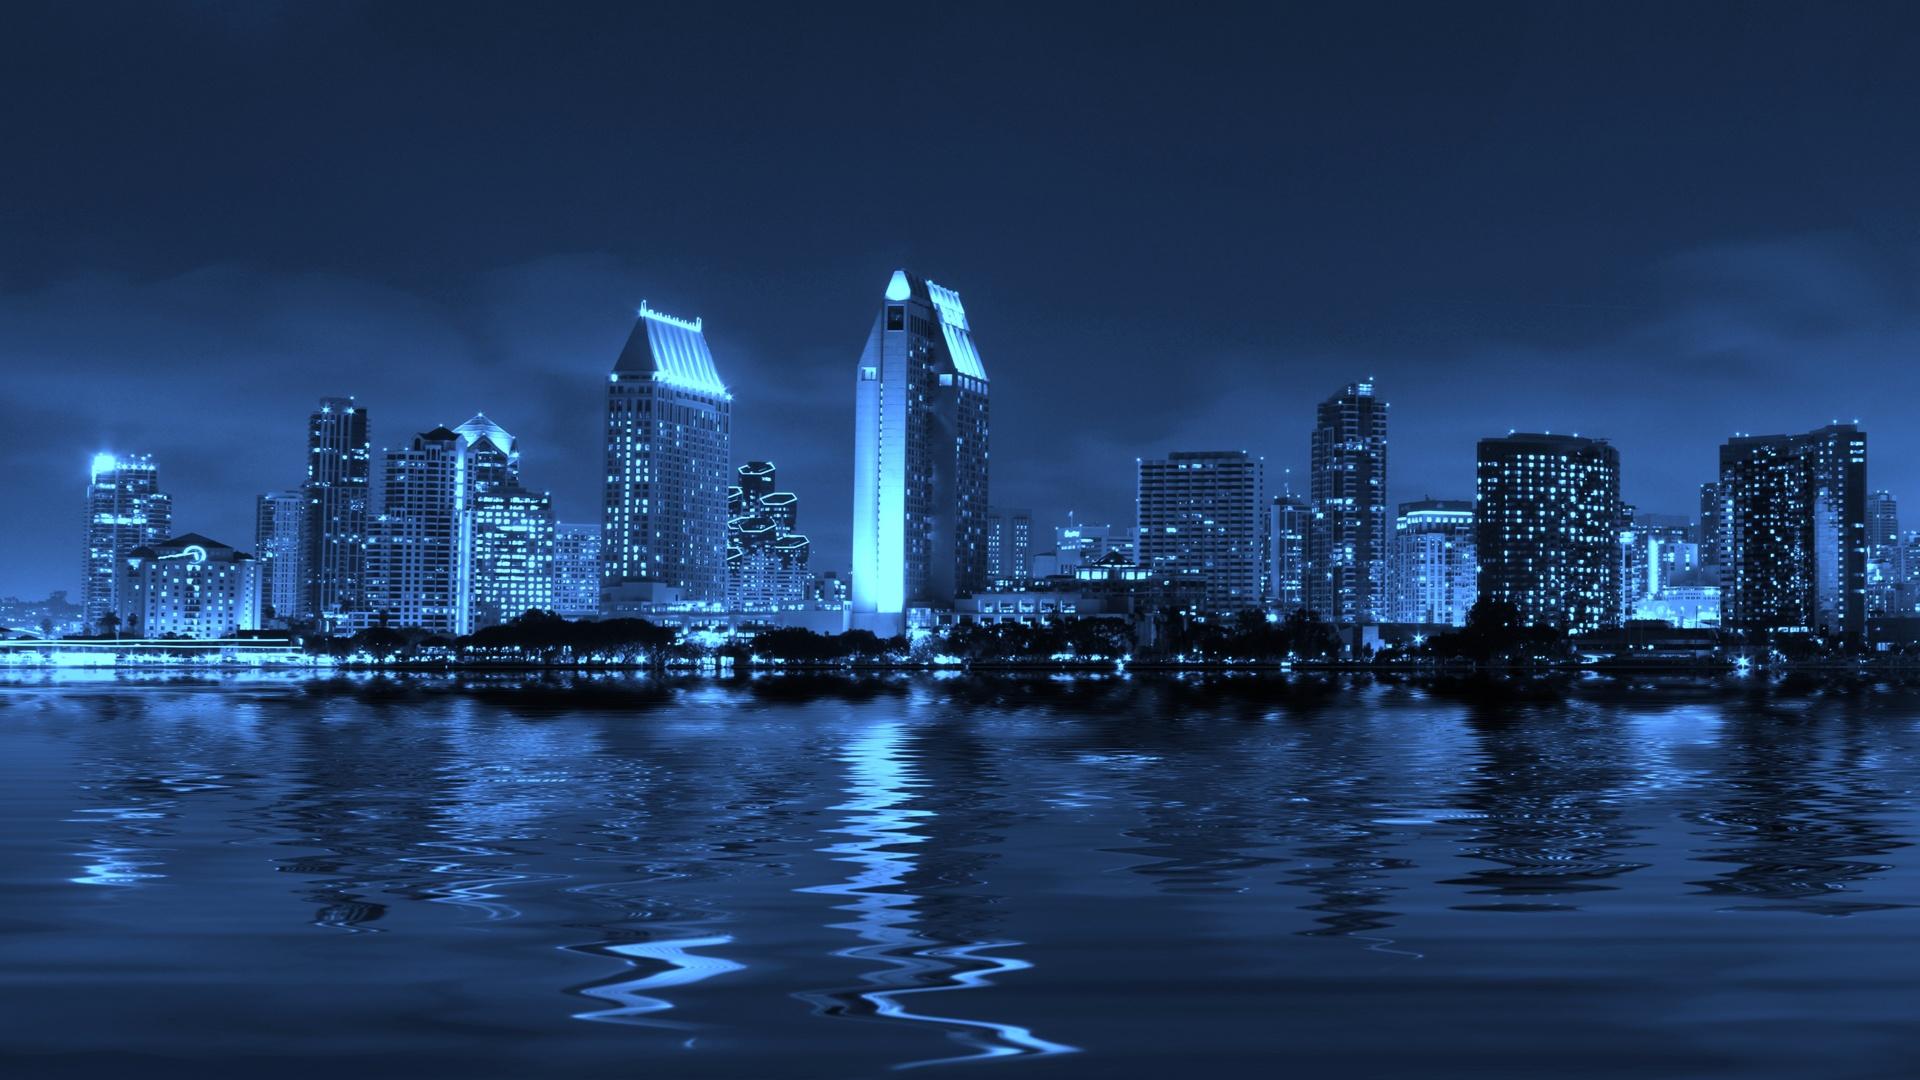 Blue Bayou San Diego 1920x1080 wallpaper download page 567675 1920x1080